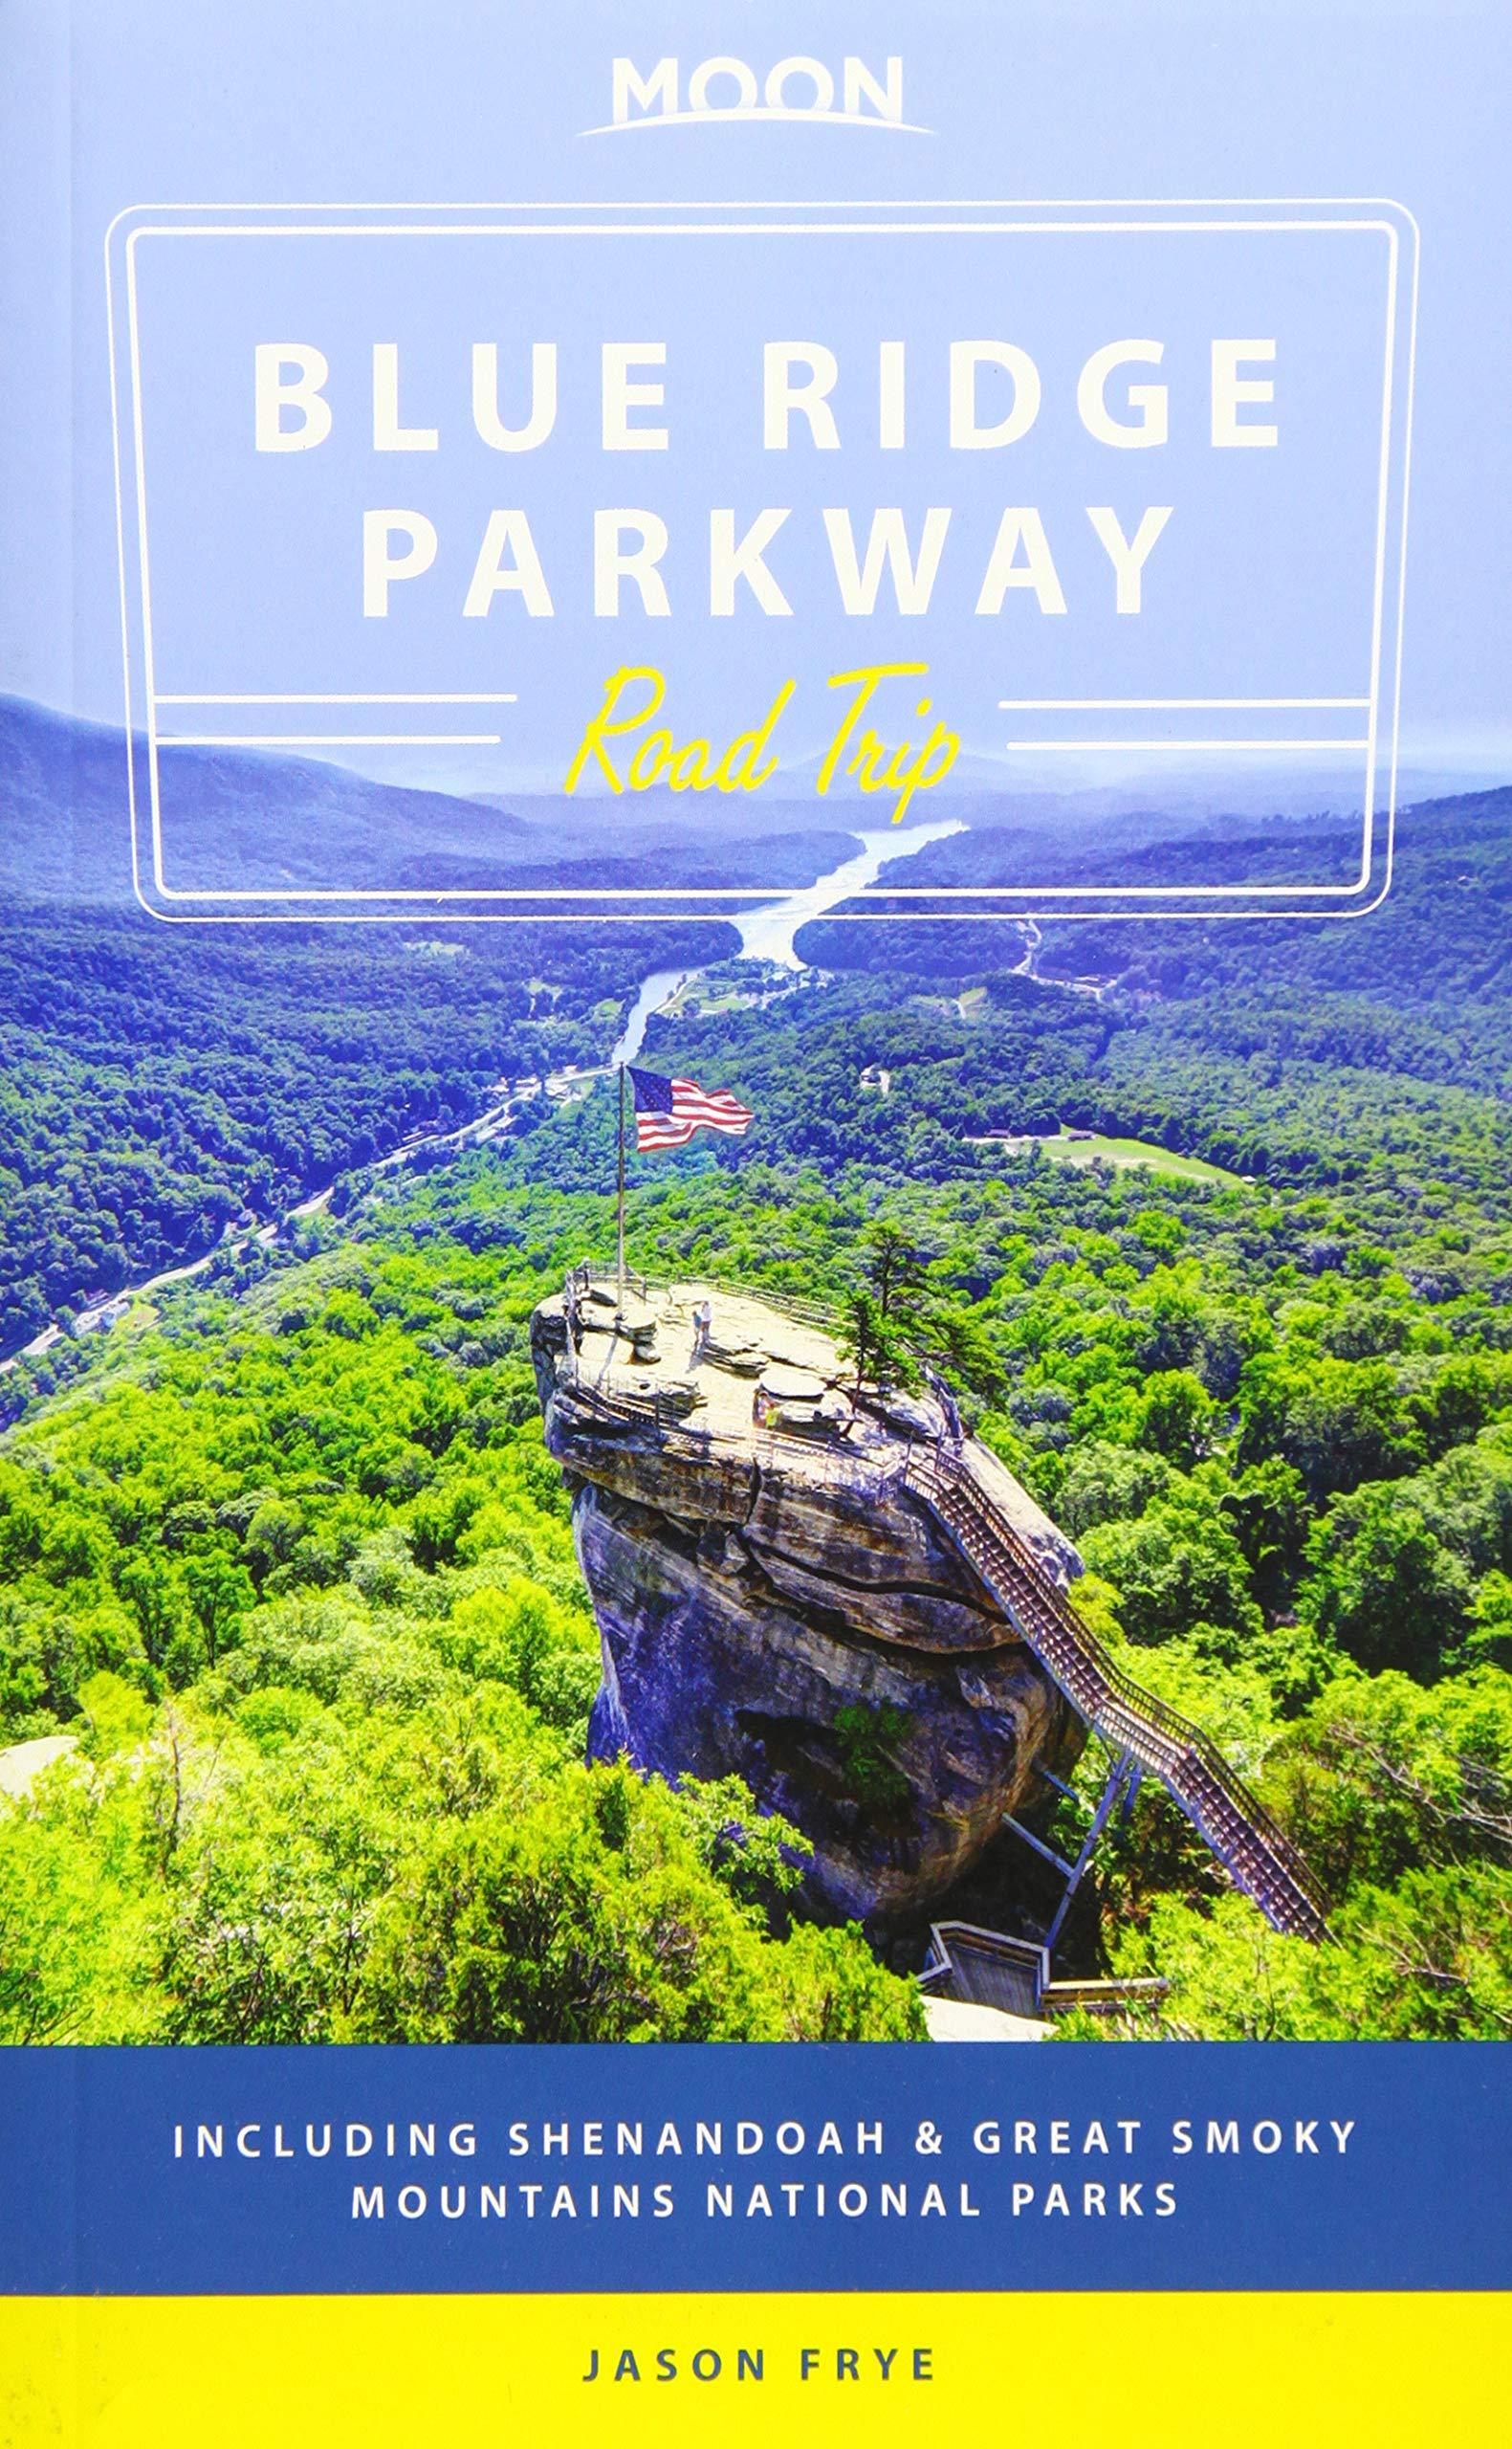 Amazon Fr Moon Blue Ridge Parkway Road Trip Including